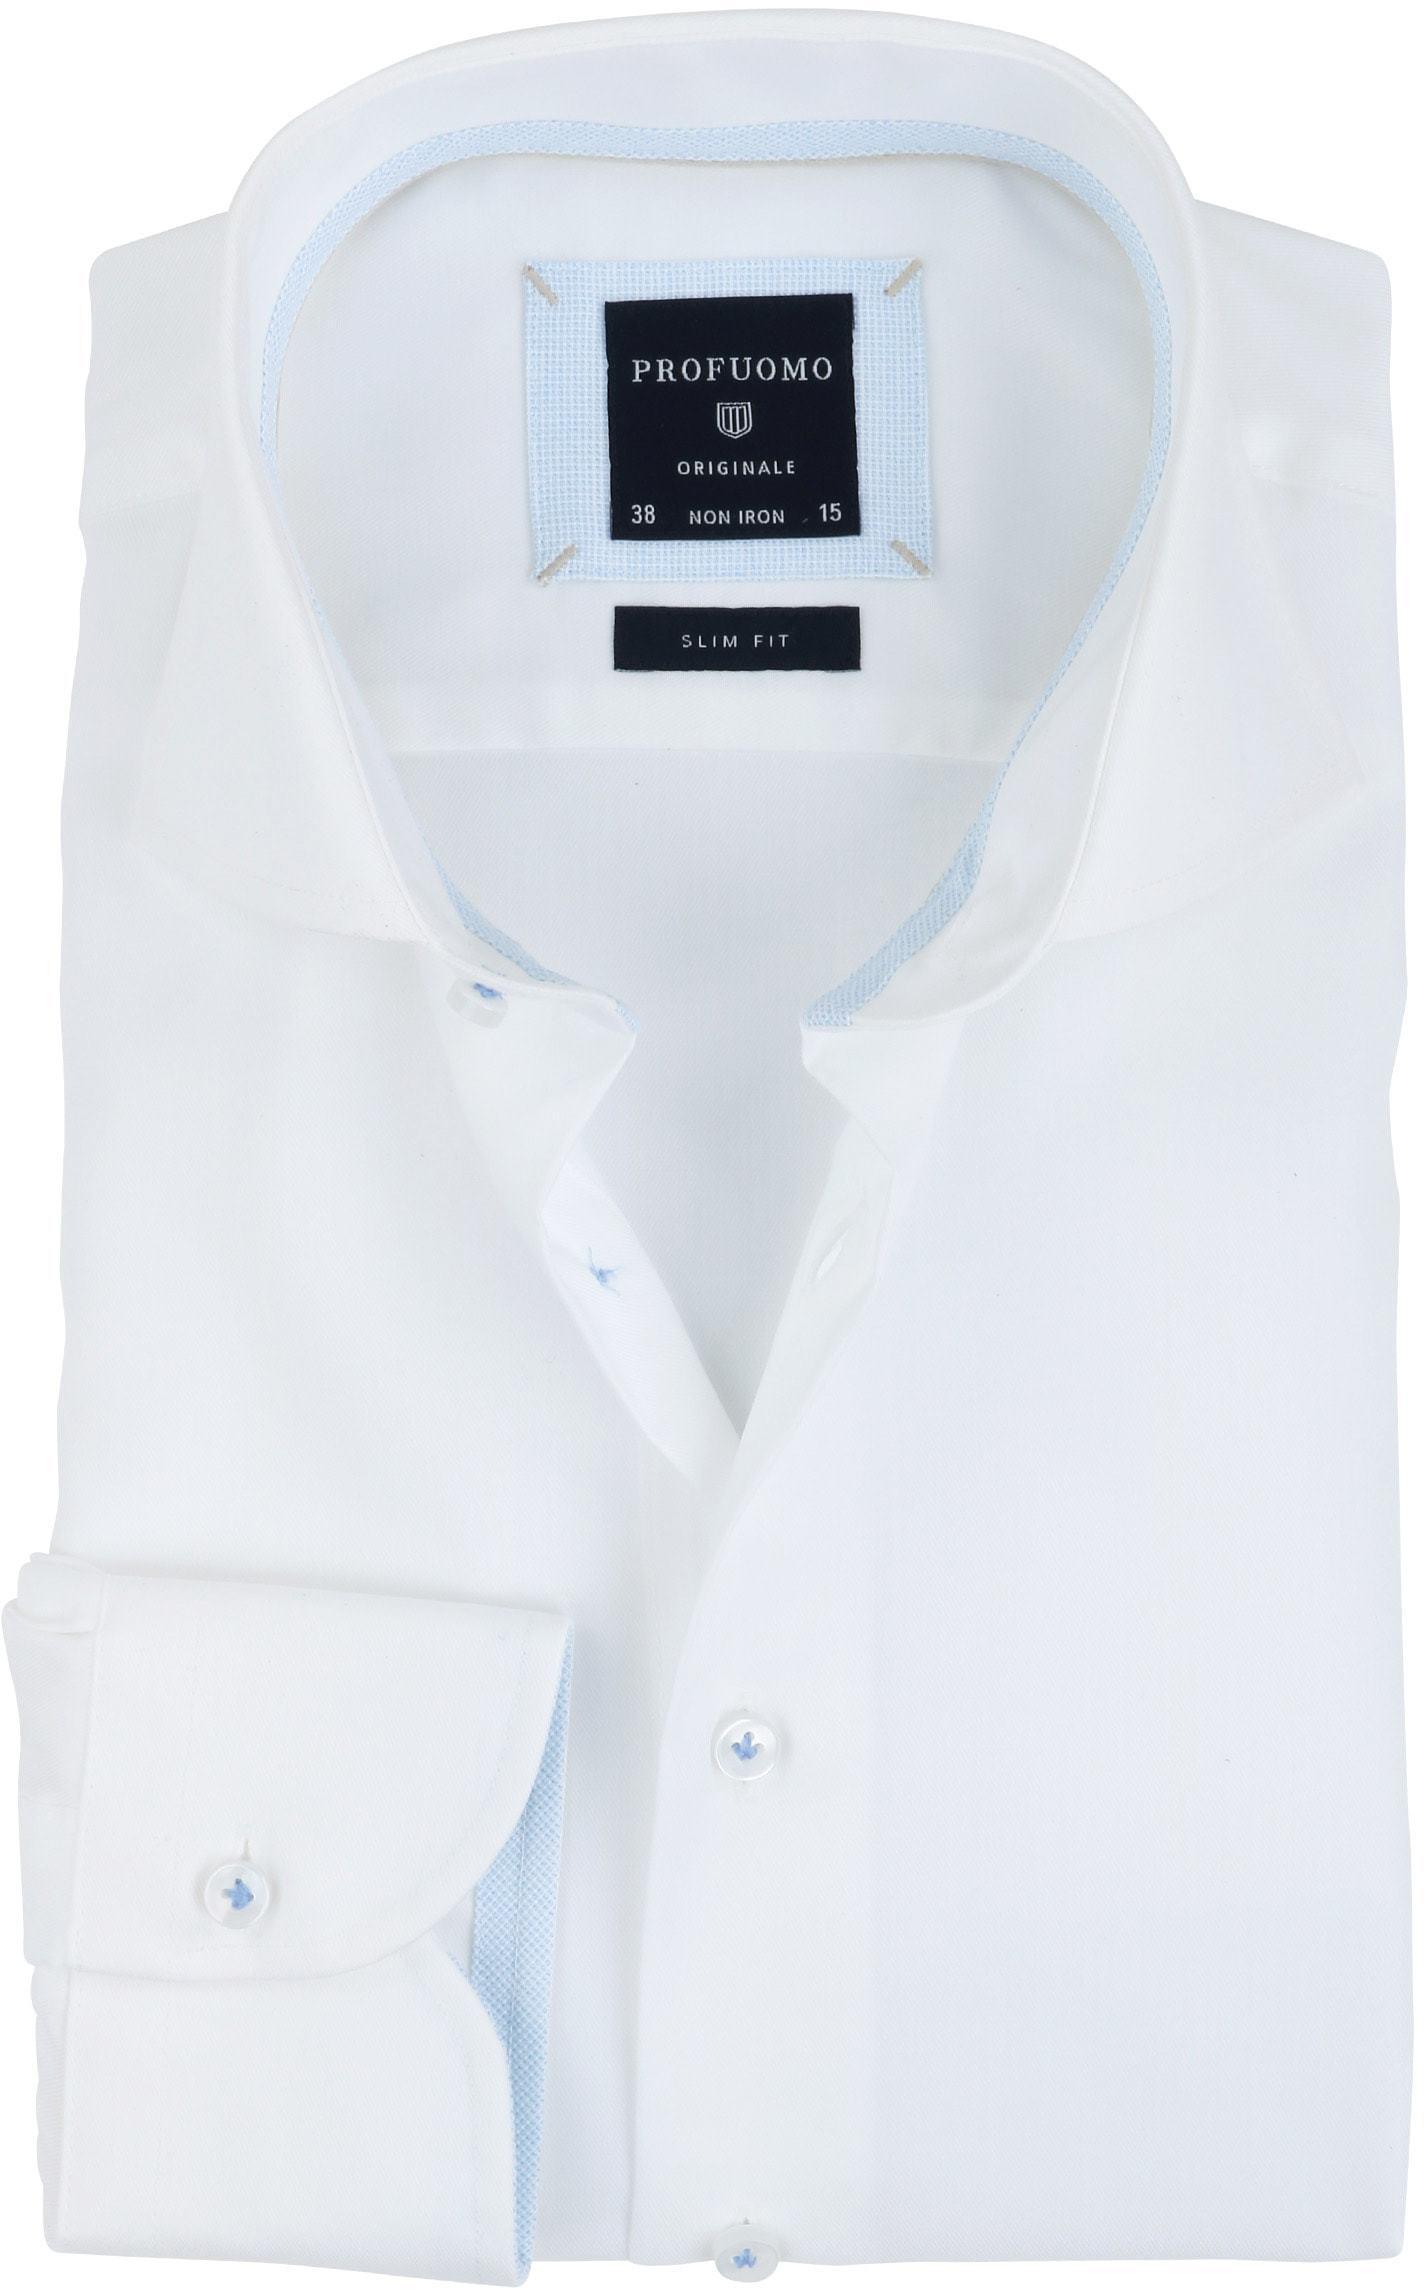 Profuomo Overhemd Strijkvrij Wit Blauw foto 0